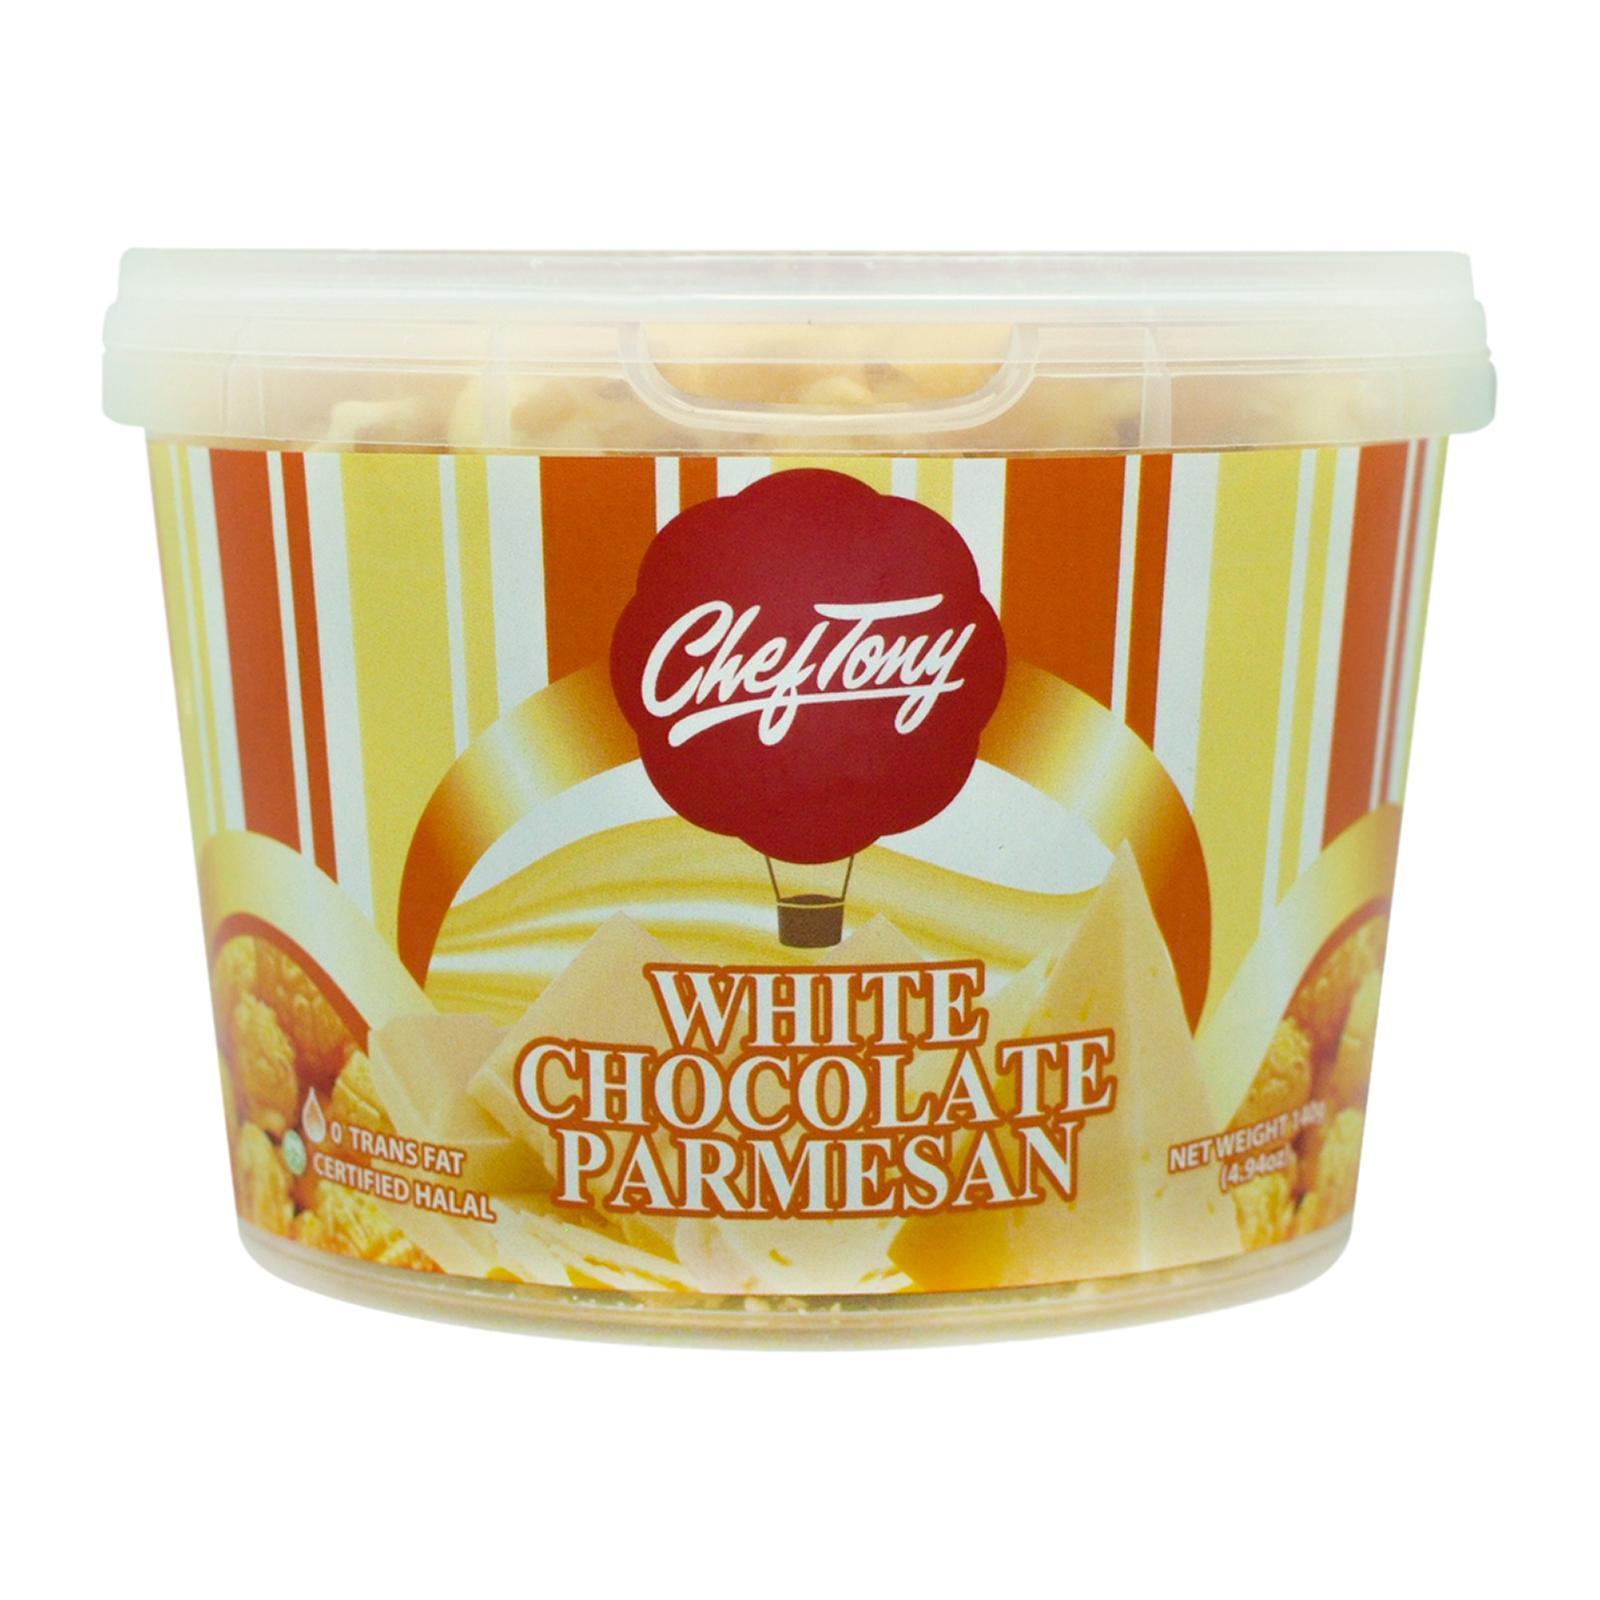 Chef Tony's Gourmet Popcorn White Chocolate Parmesan - Small Tub